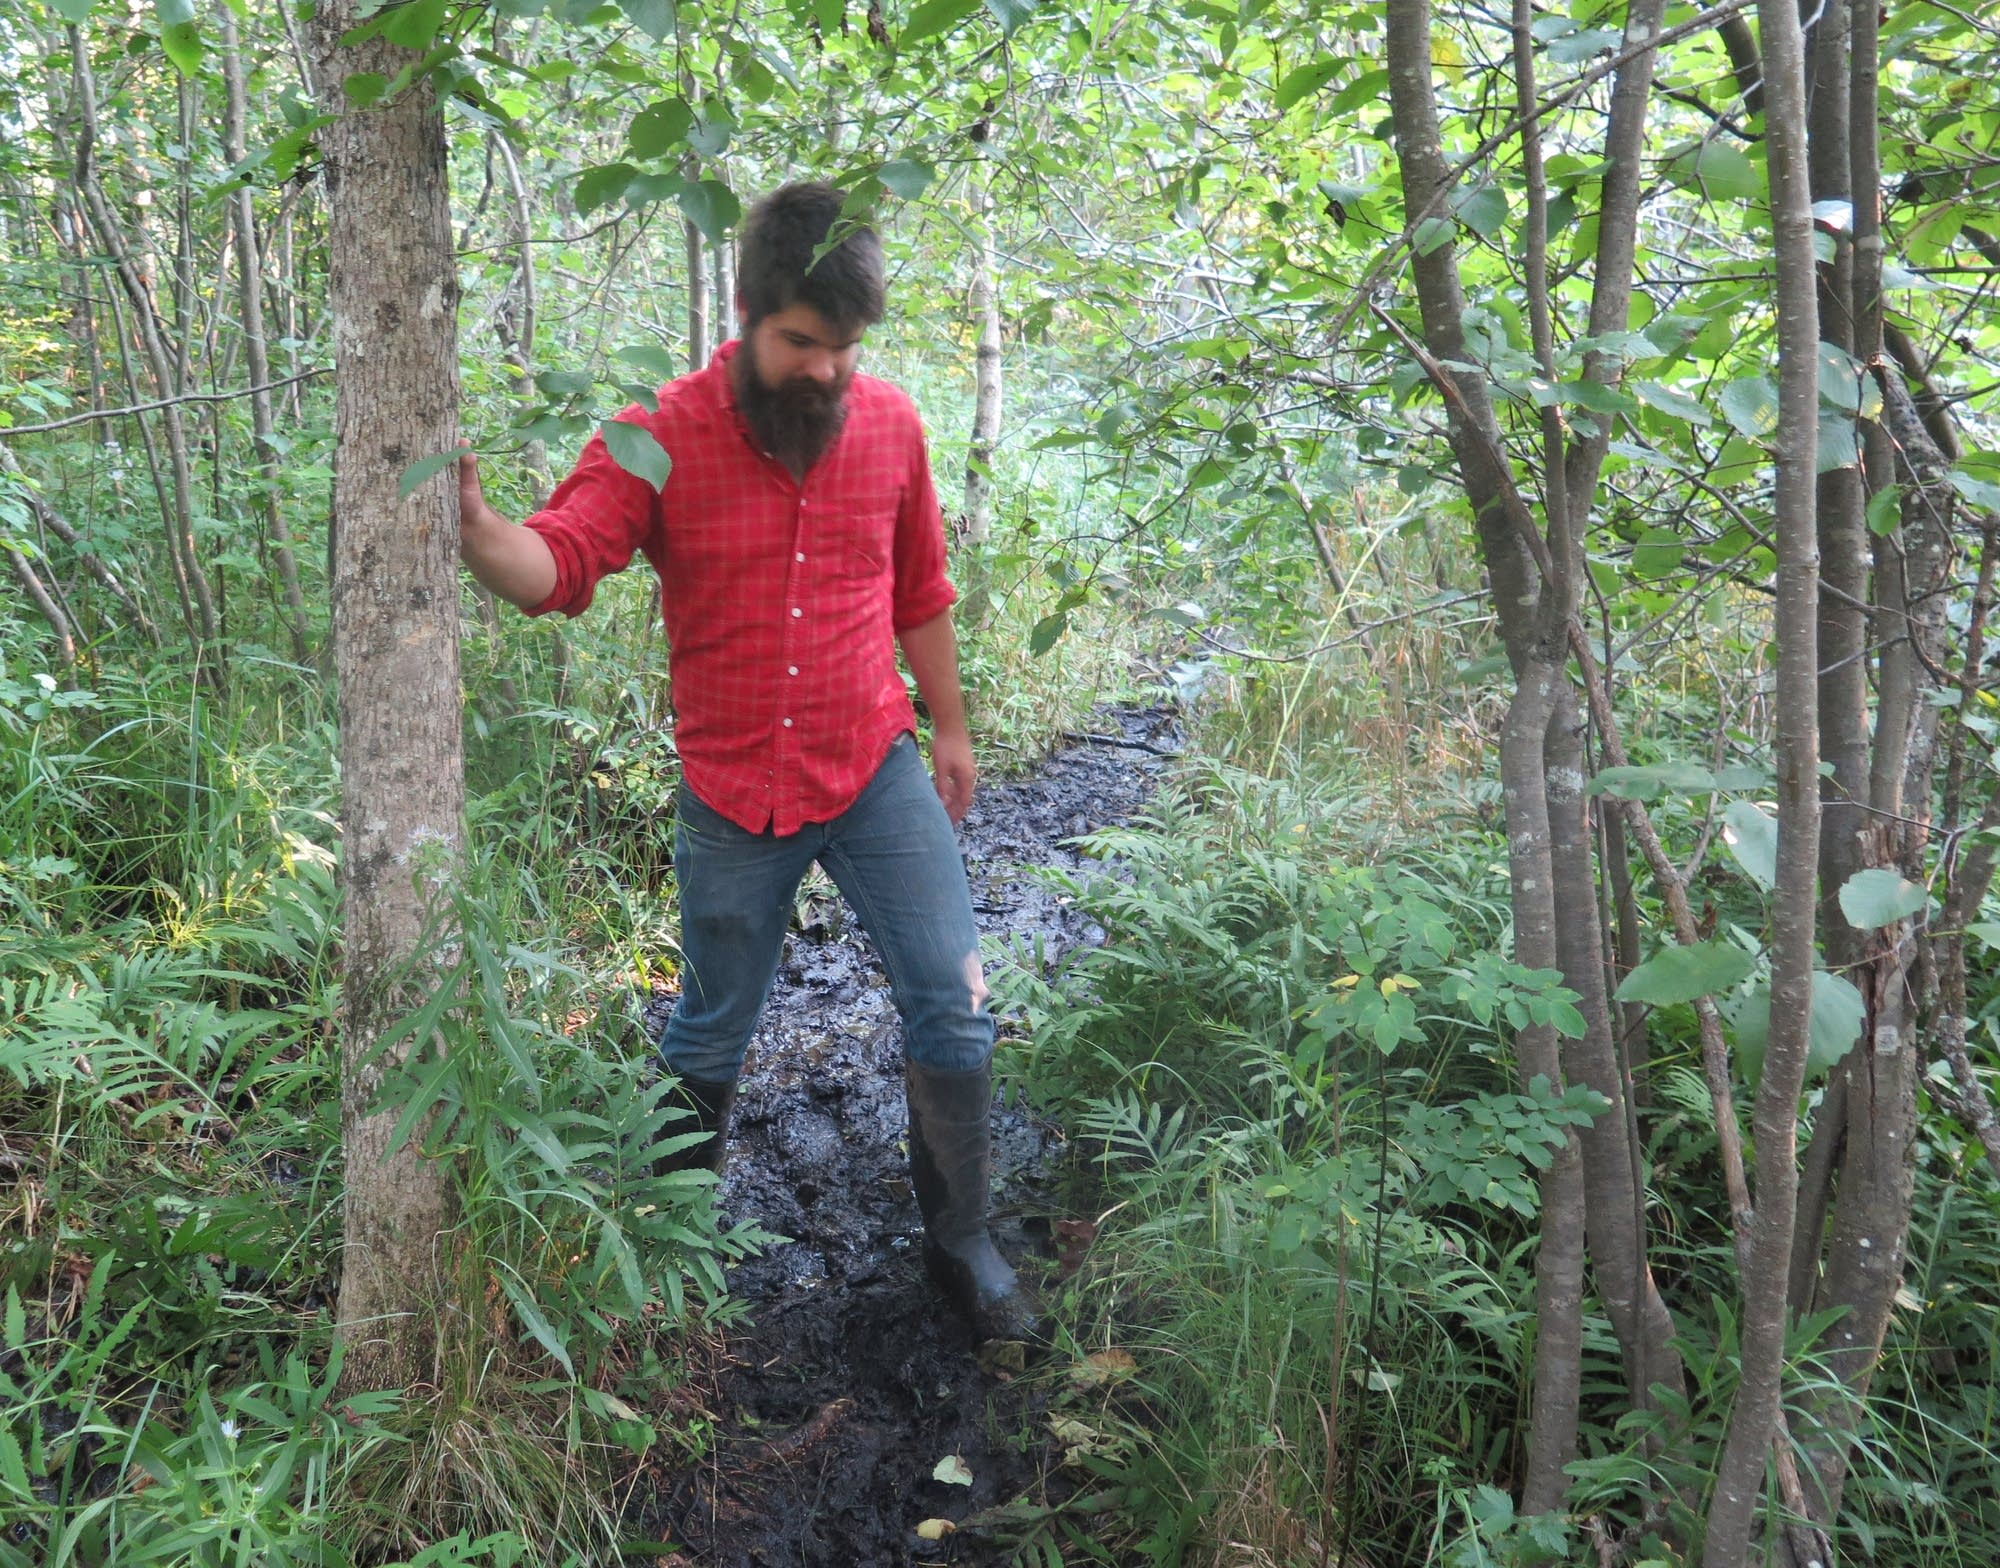 Blake Romenesko navigates a muddy trail to his campsite.